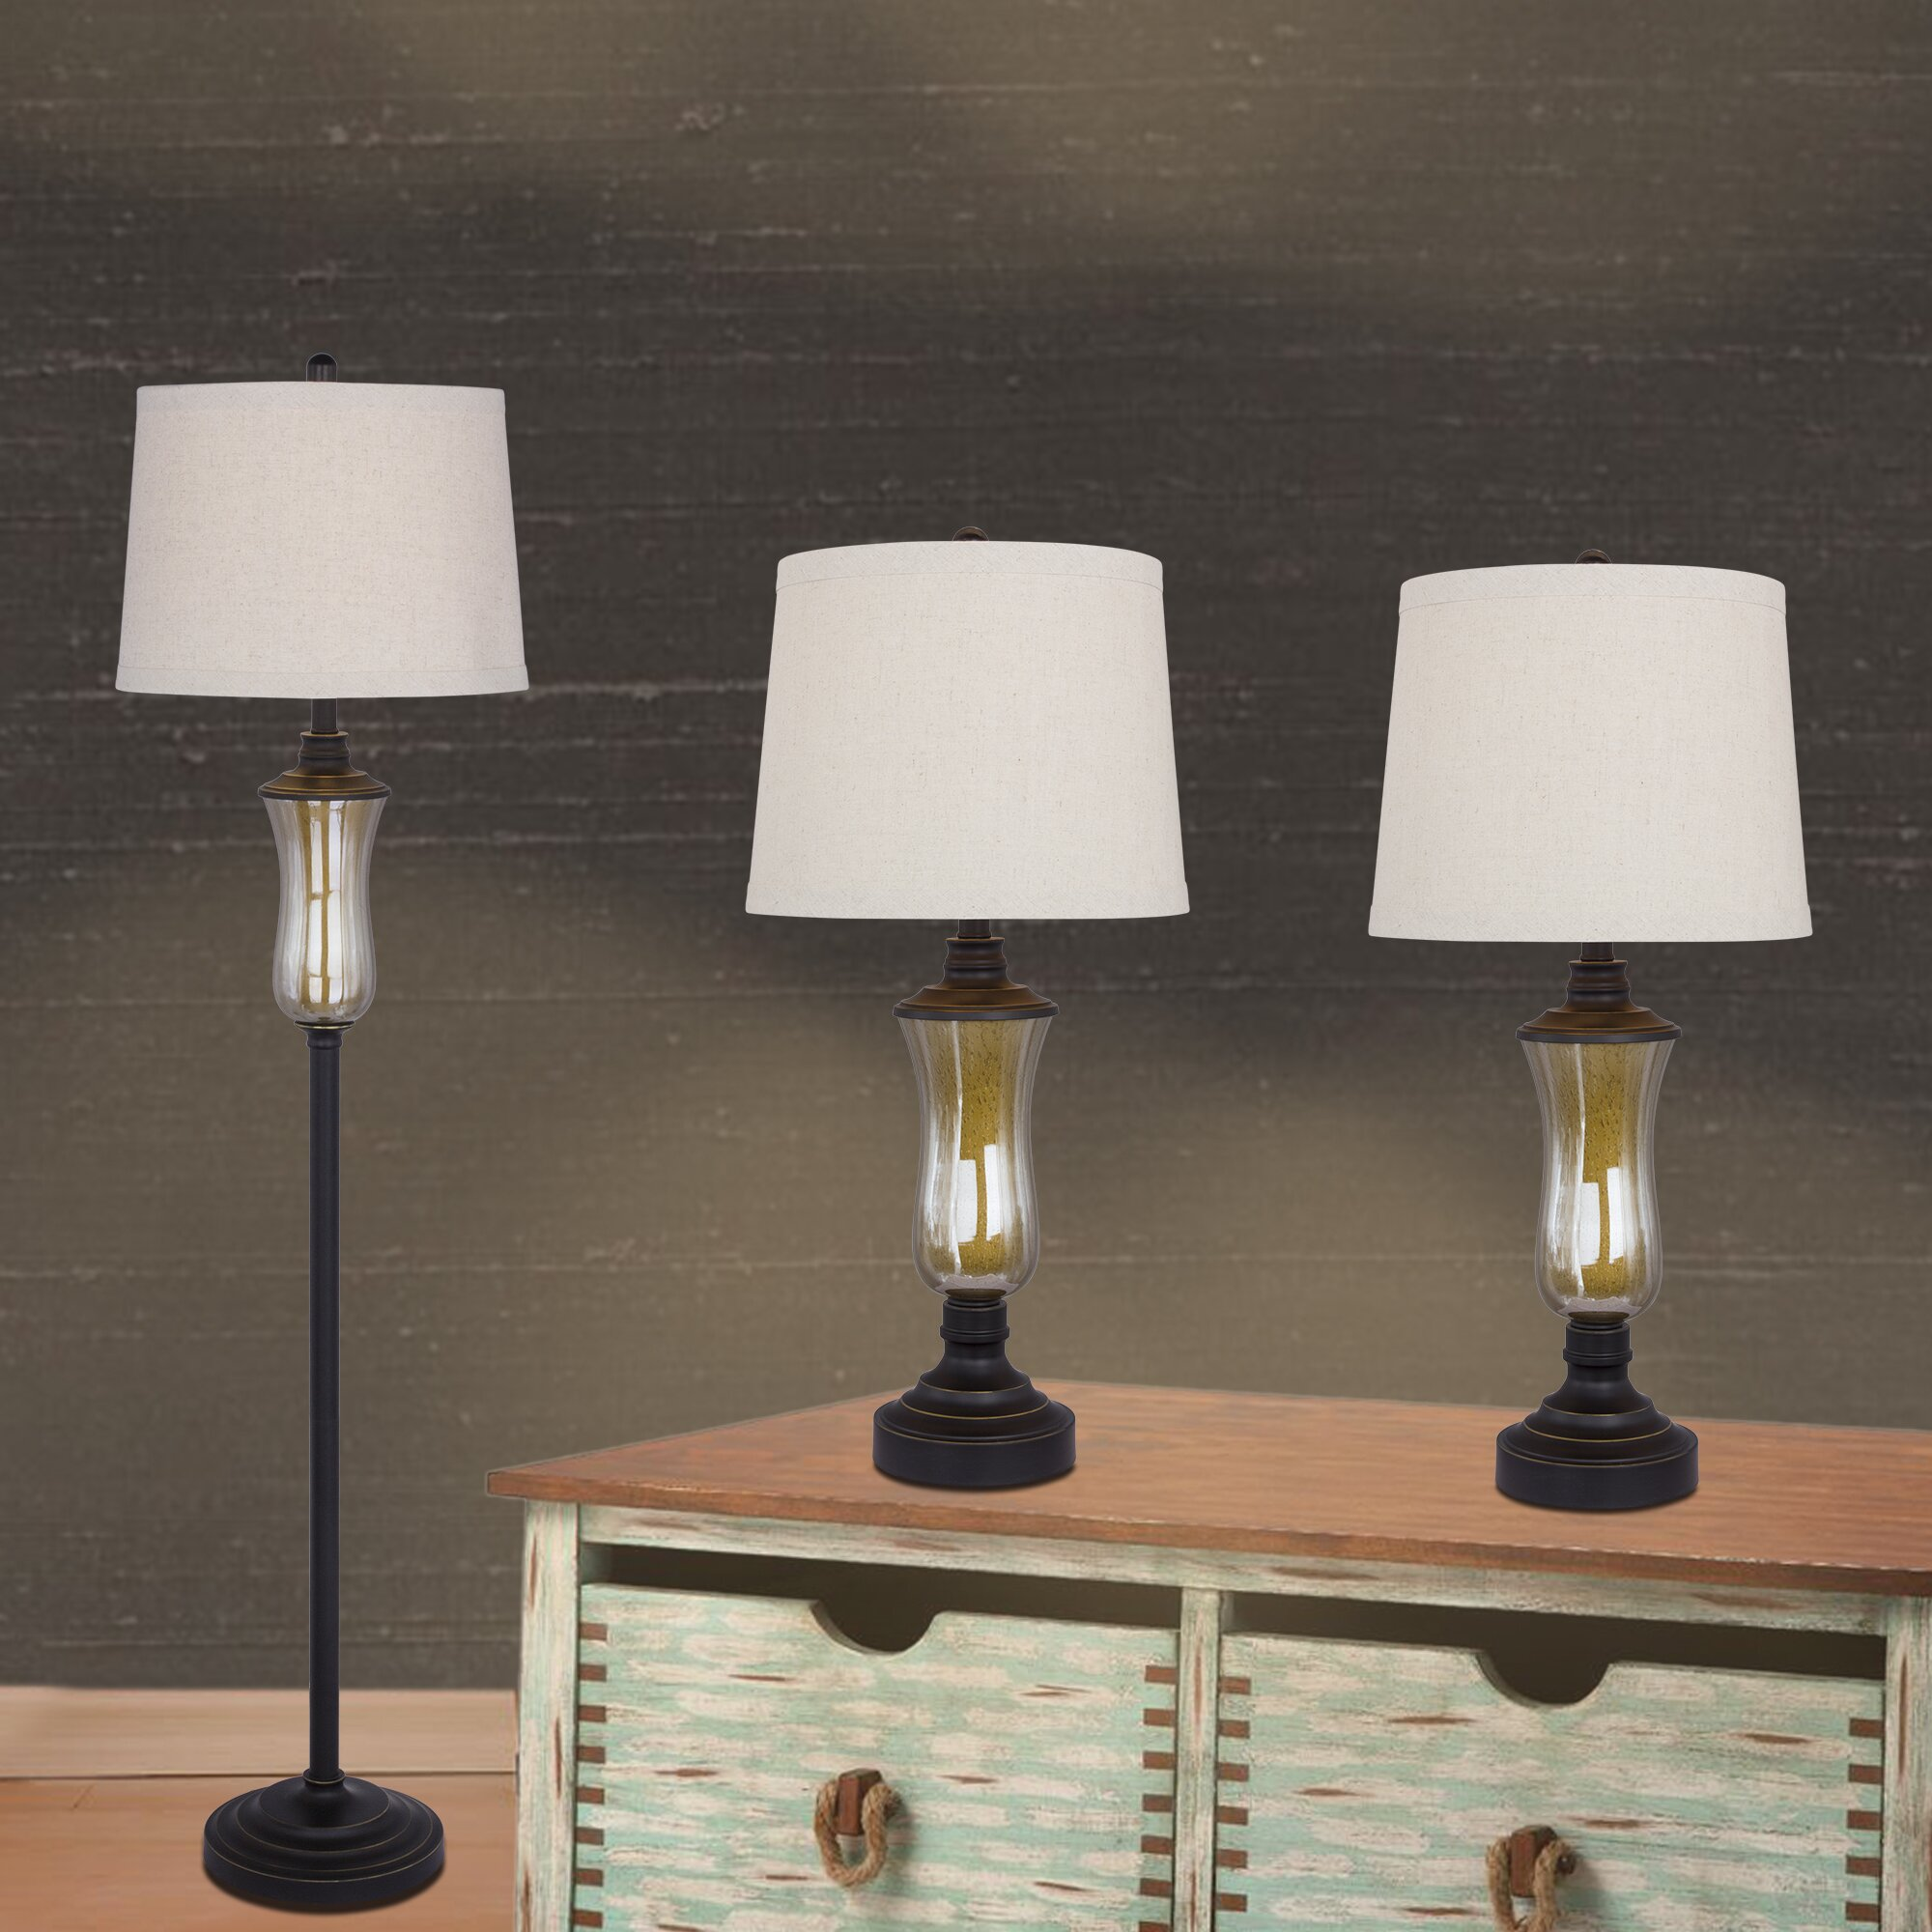 lighting lamps table lamps fangio sku fg2126. Black Bedroom Furniture Sets. Home Design Ideas